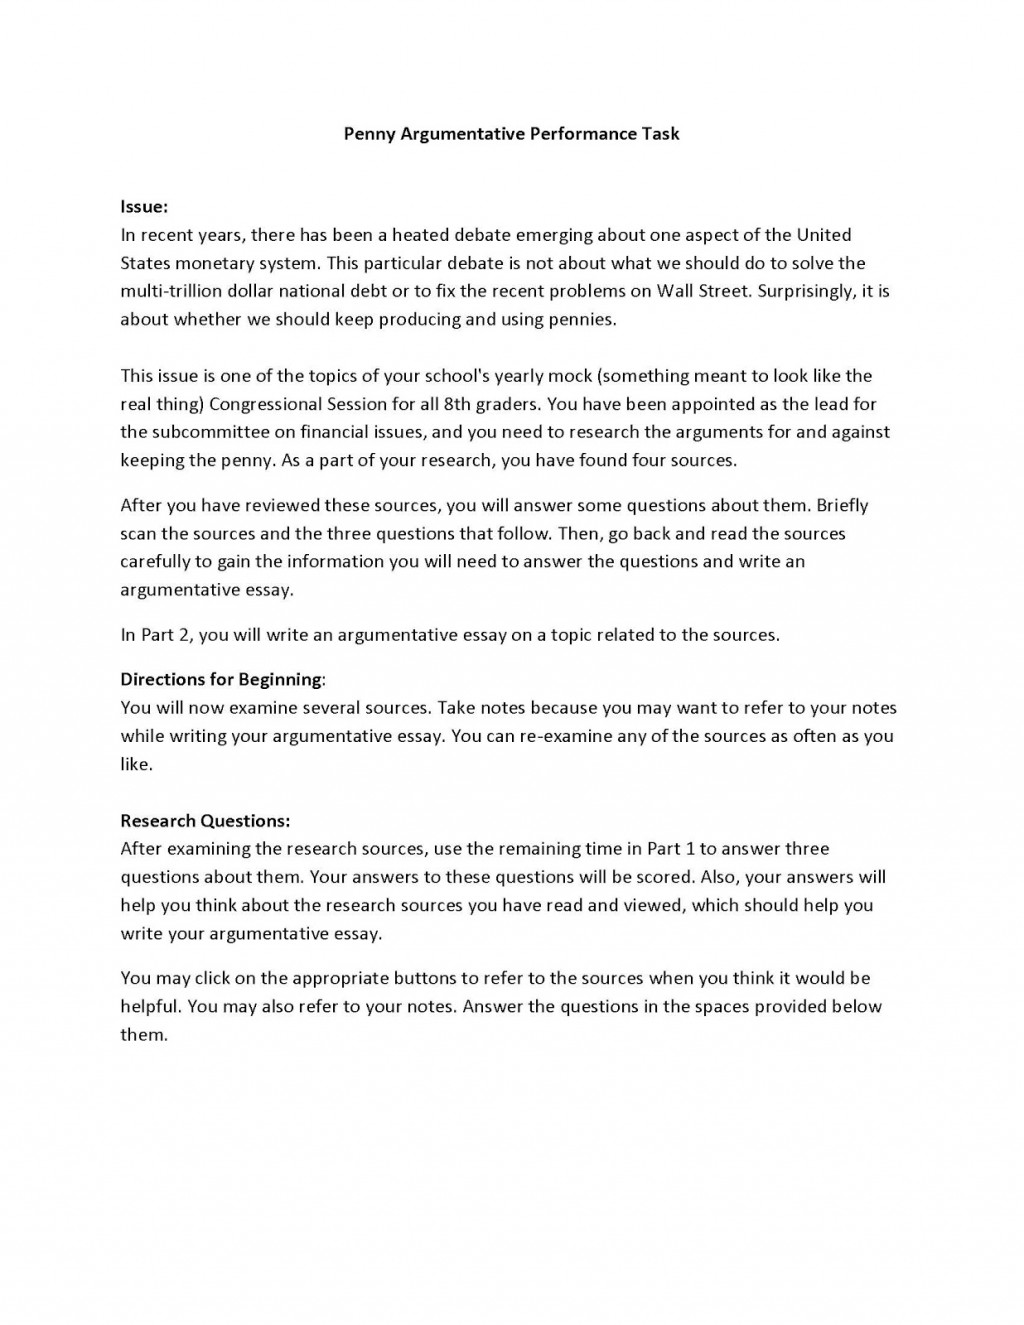 013 Death Penalty Essay Argumentative Essays On Of Argumentation Introduction Ljdbuiws8cqmm8eyorzbfjagydkosgefch8x57fxk67naismkfqlitegqbfawiqrnovq Persuasive Against Conclusion Awful Pros And Cons Large